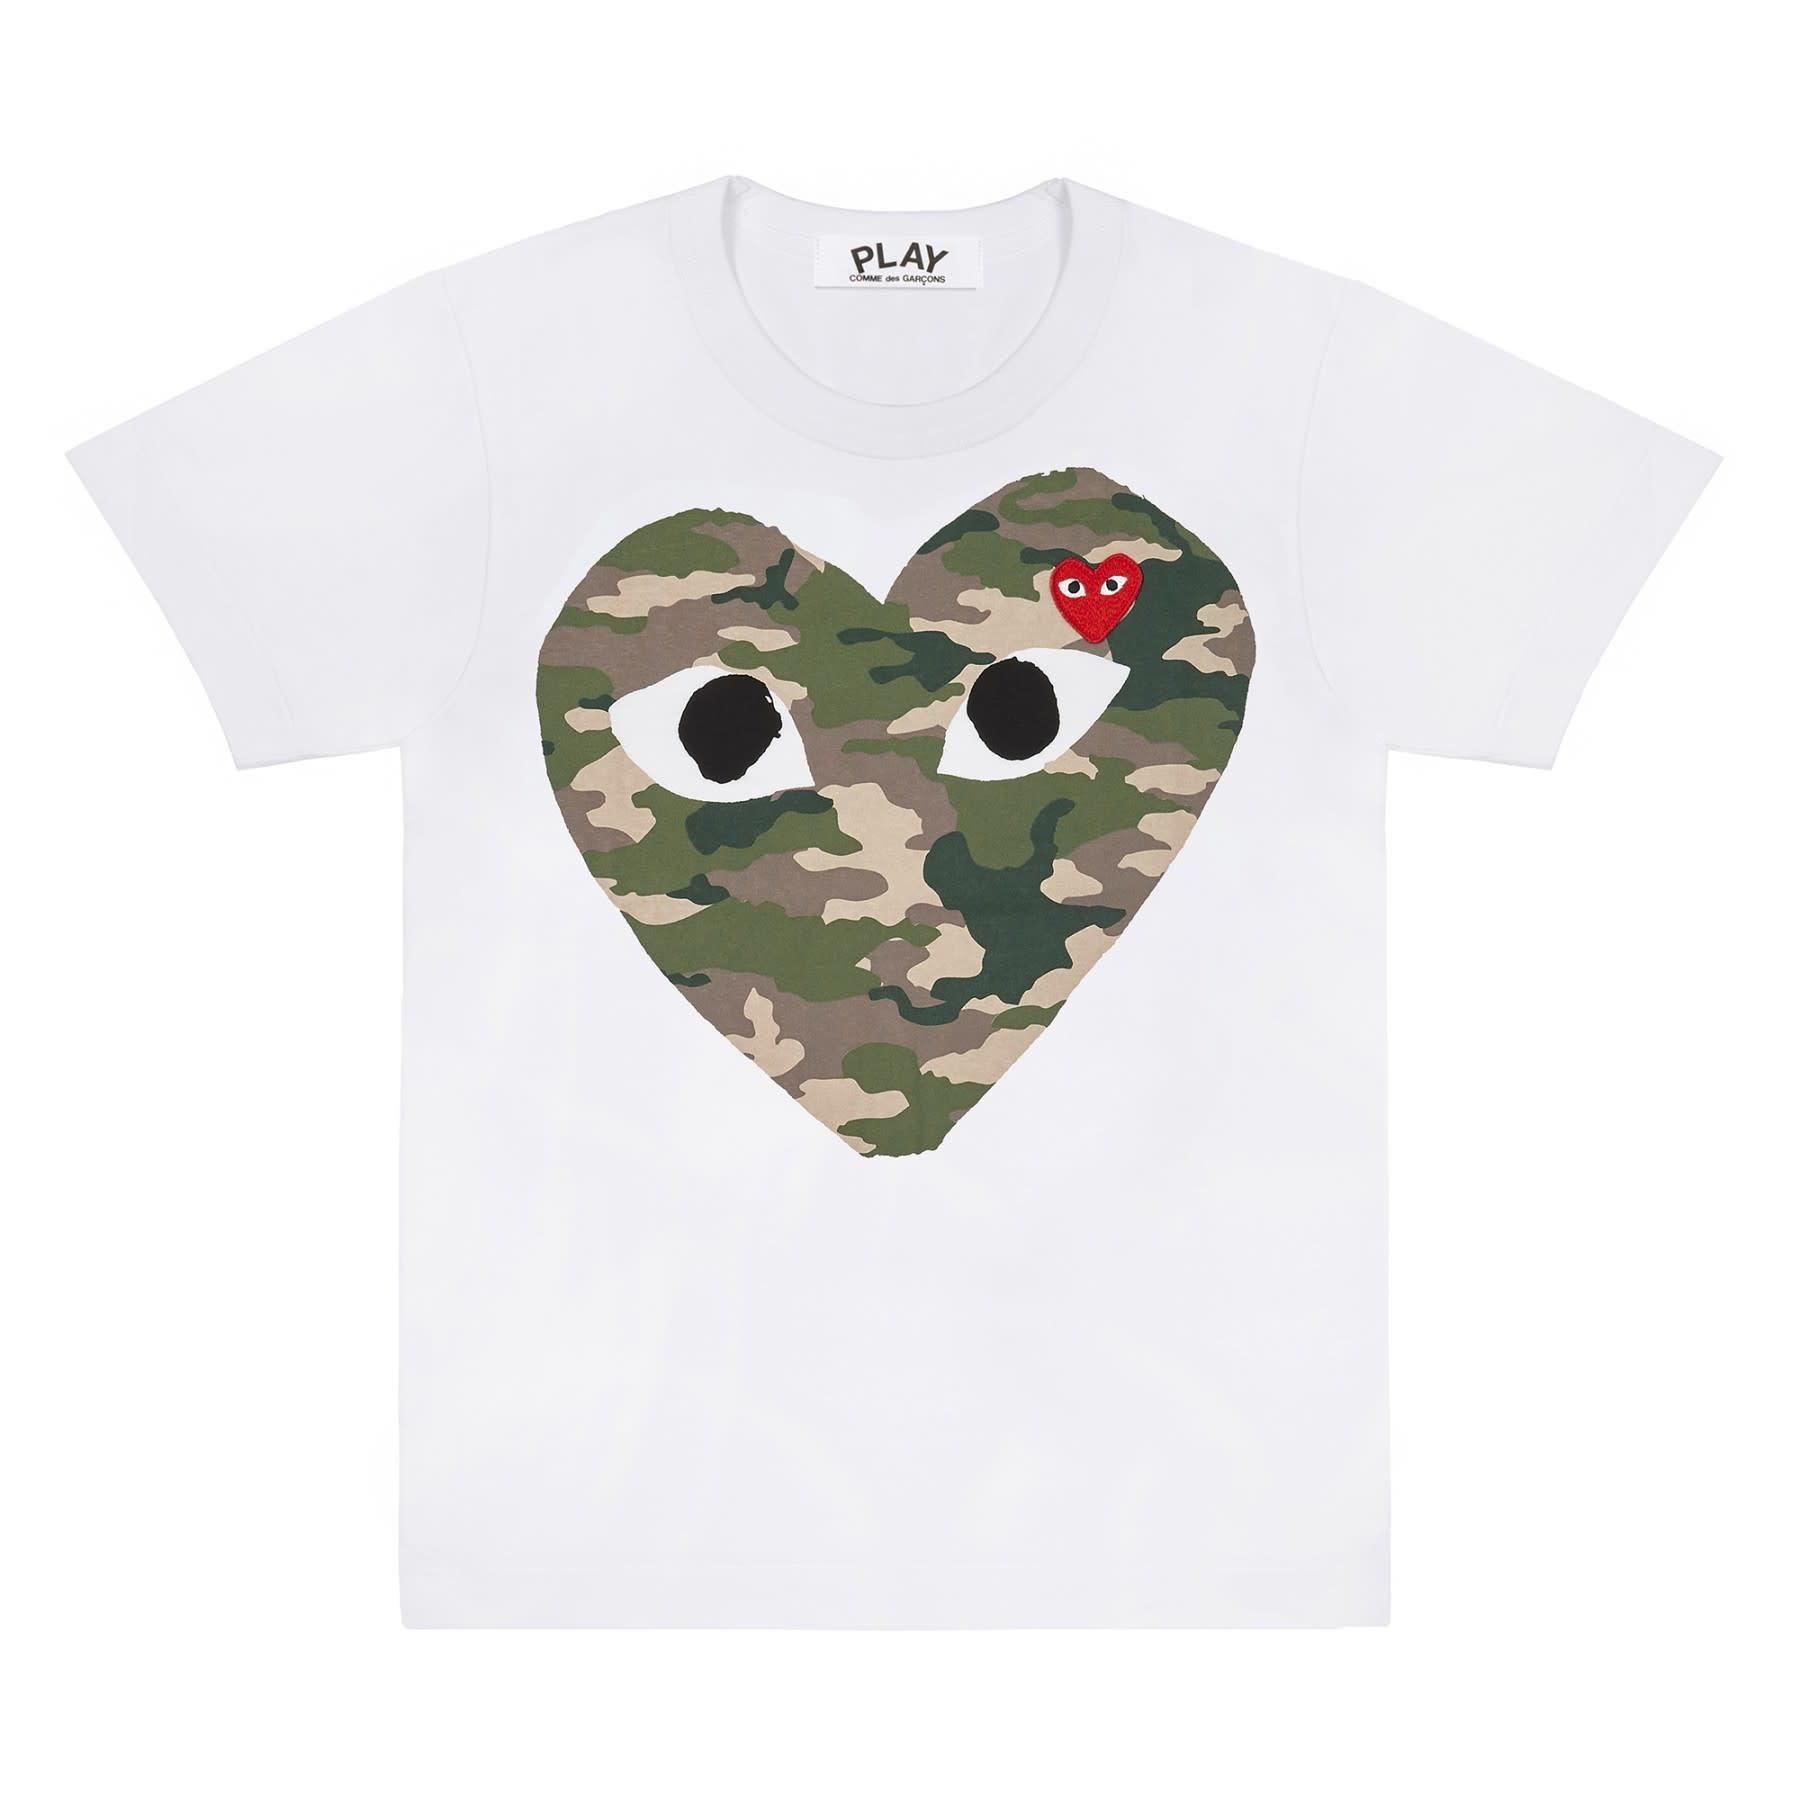 COMME des GARÇONS PLAY Camo Big Heart T-shirt in White